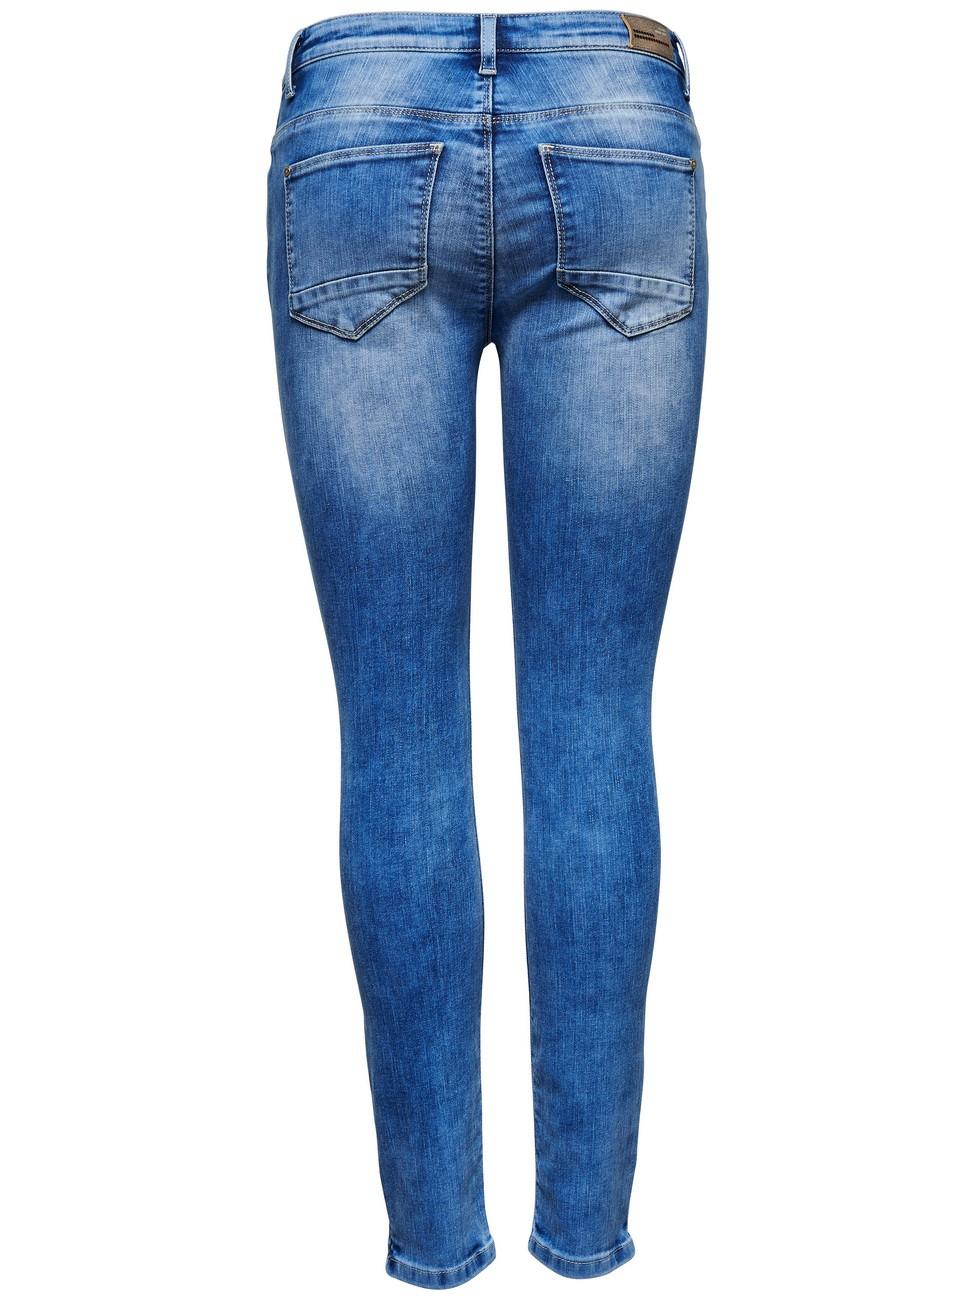 Only Damen Jeans onlKENDELL - Skinny Fit - Blau - Light Blue Denim